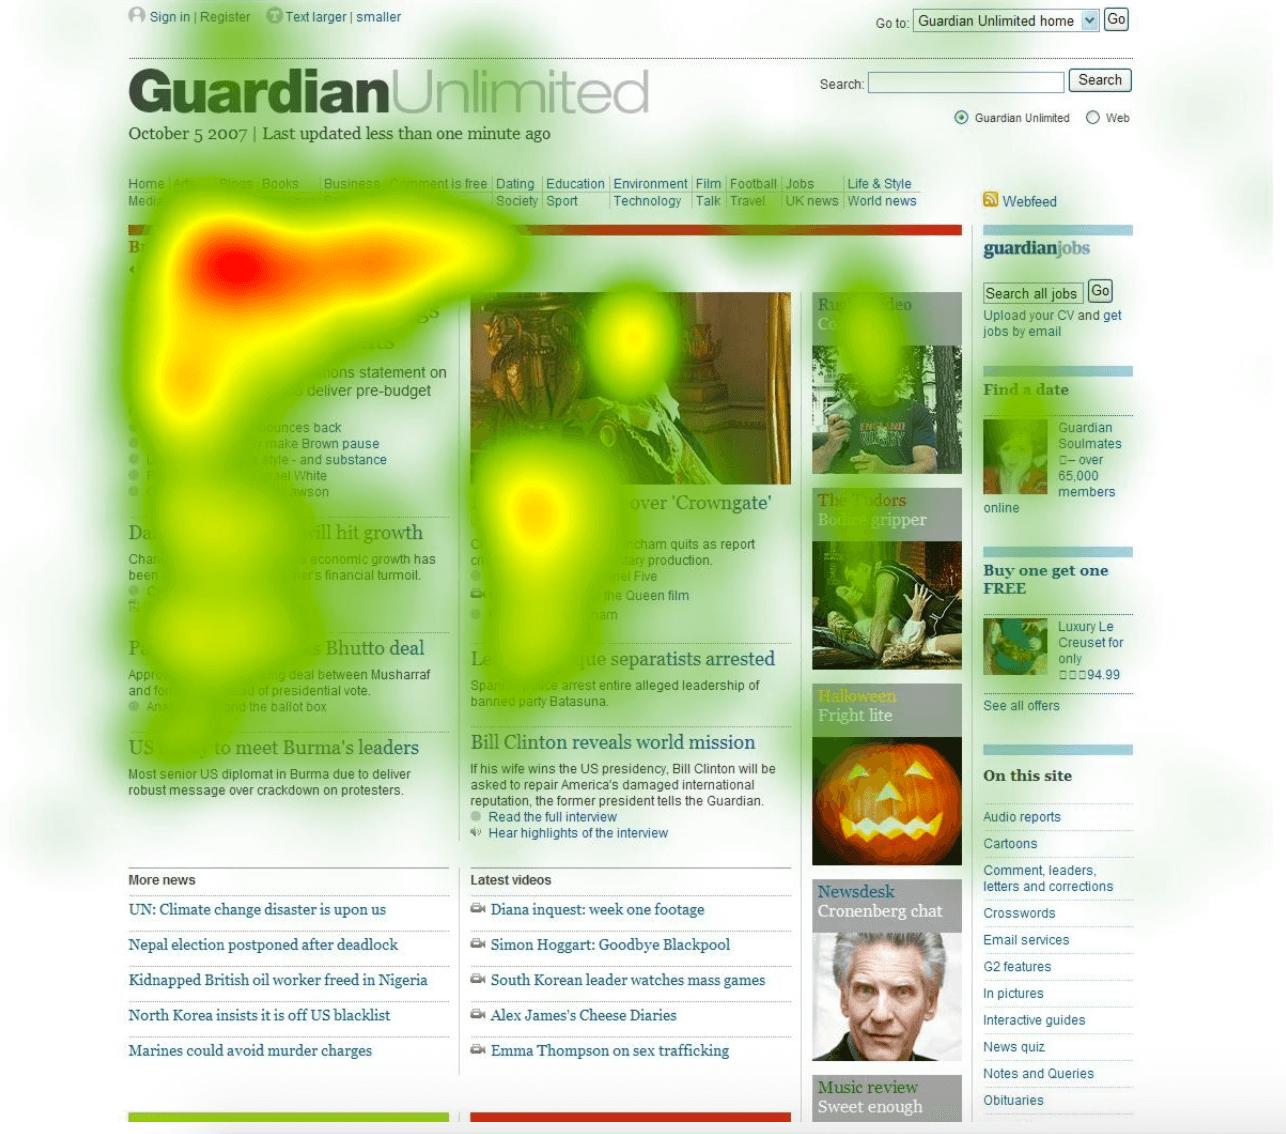 increase-user-engagement-website-crazyegg-heatmaps